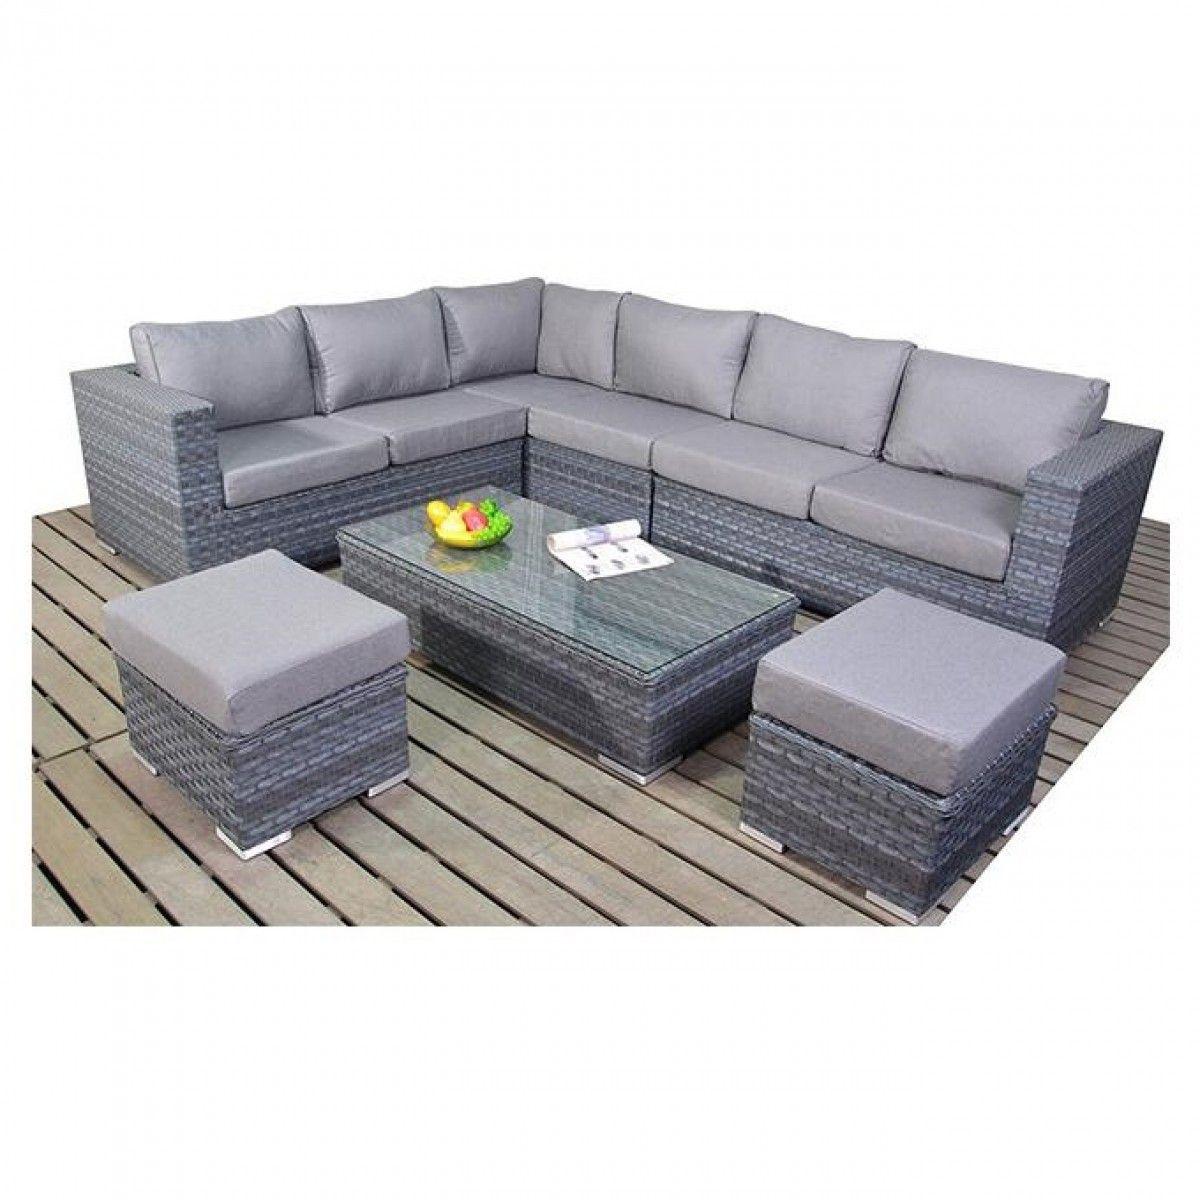 Port Royal Platinum Large Corner Sofa Set Wgf 502 Furniture Corner Sofa Set Rattan Garden Furniture